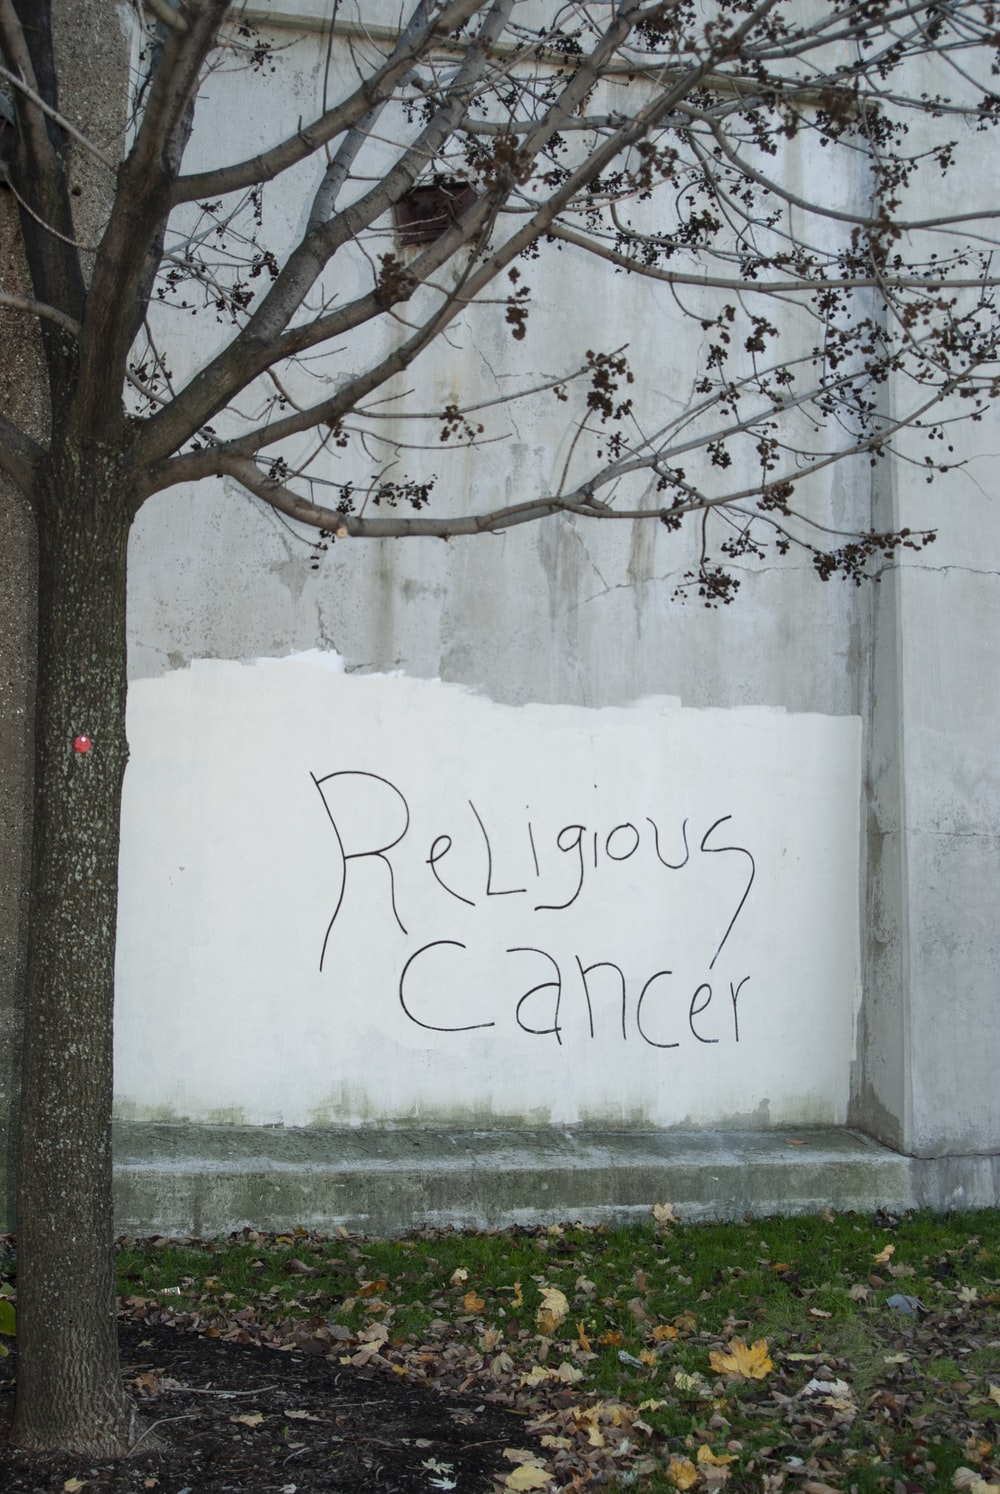 religious cancer text